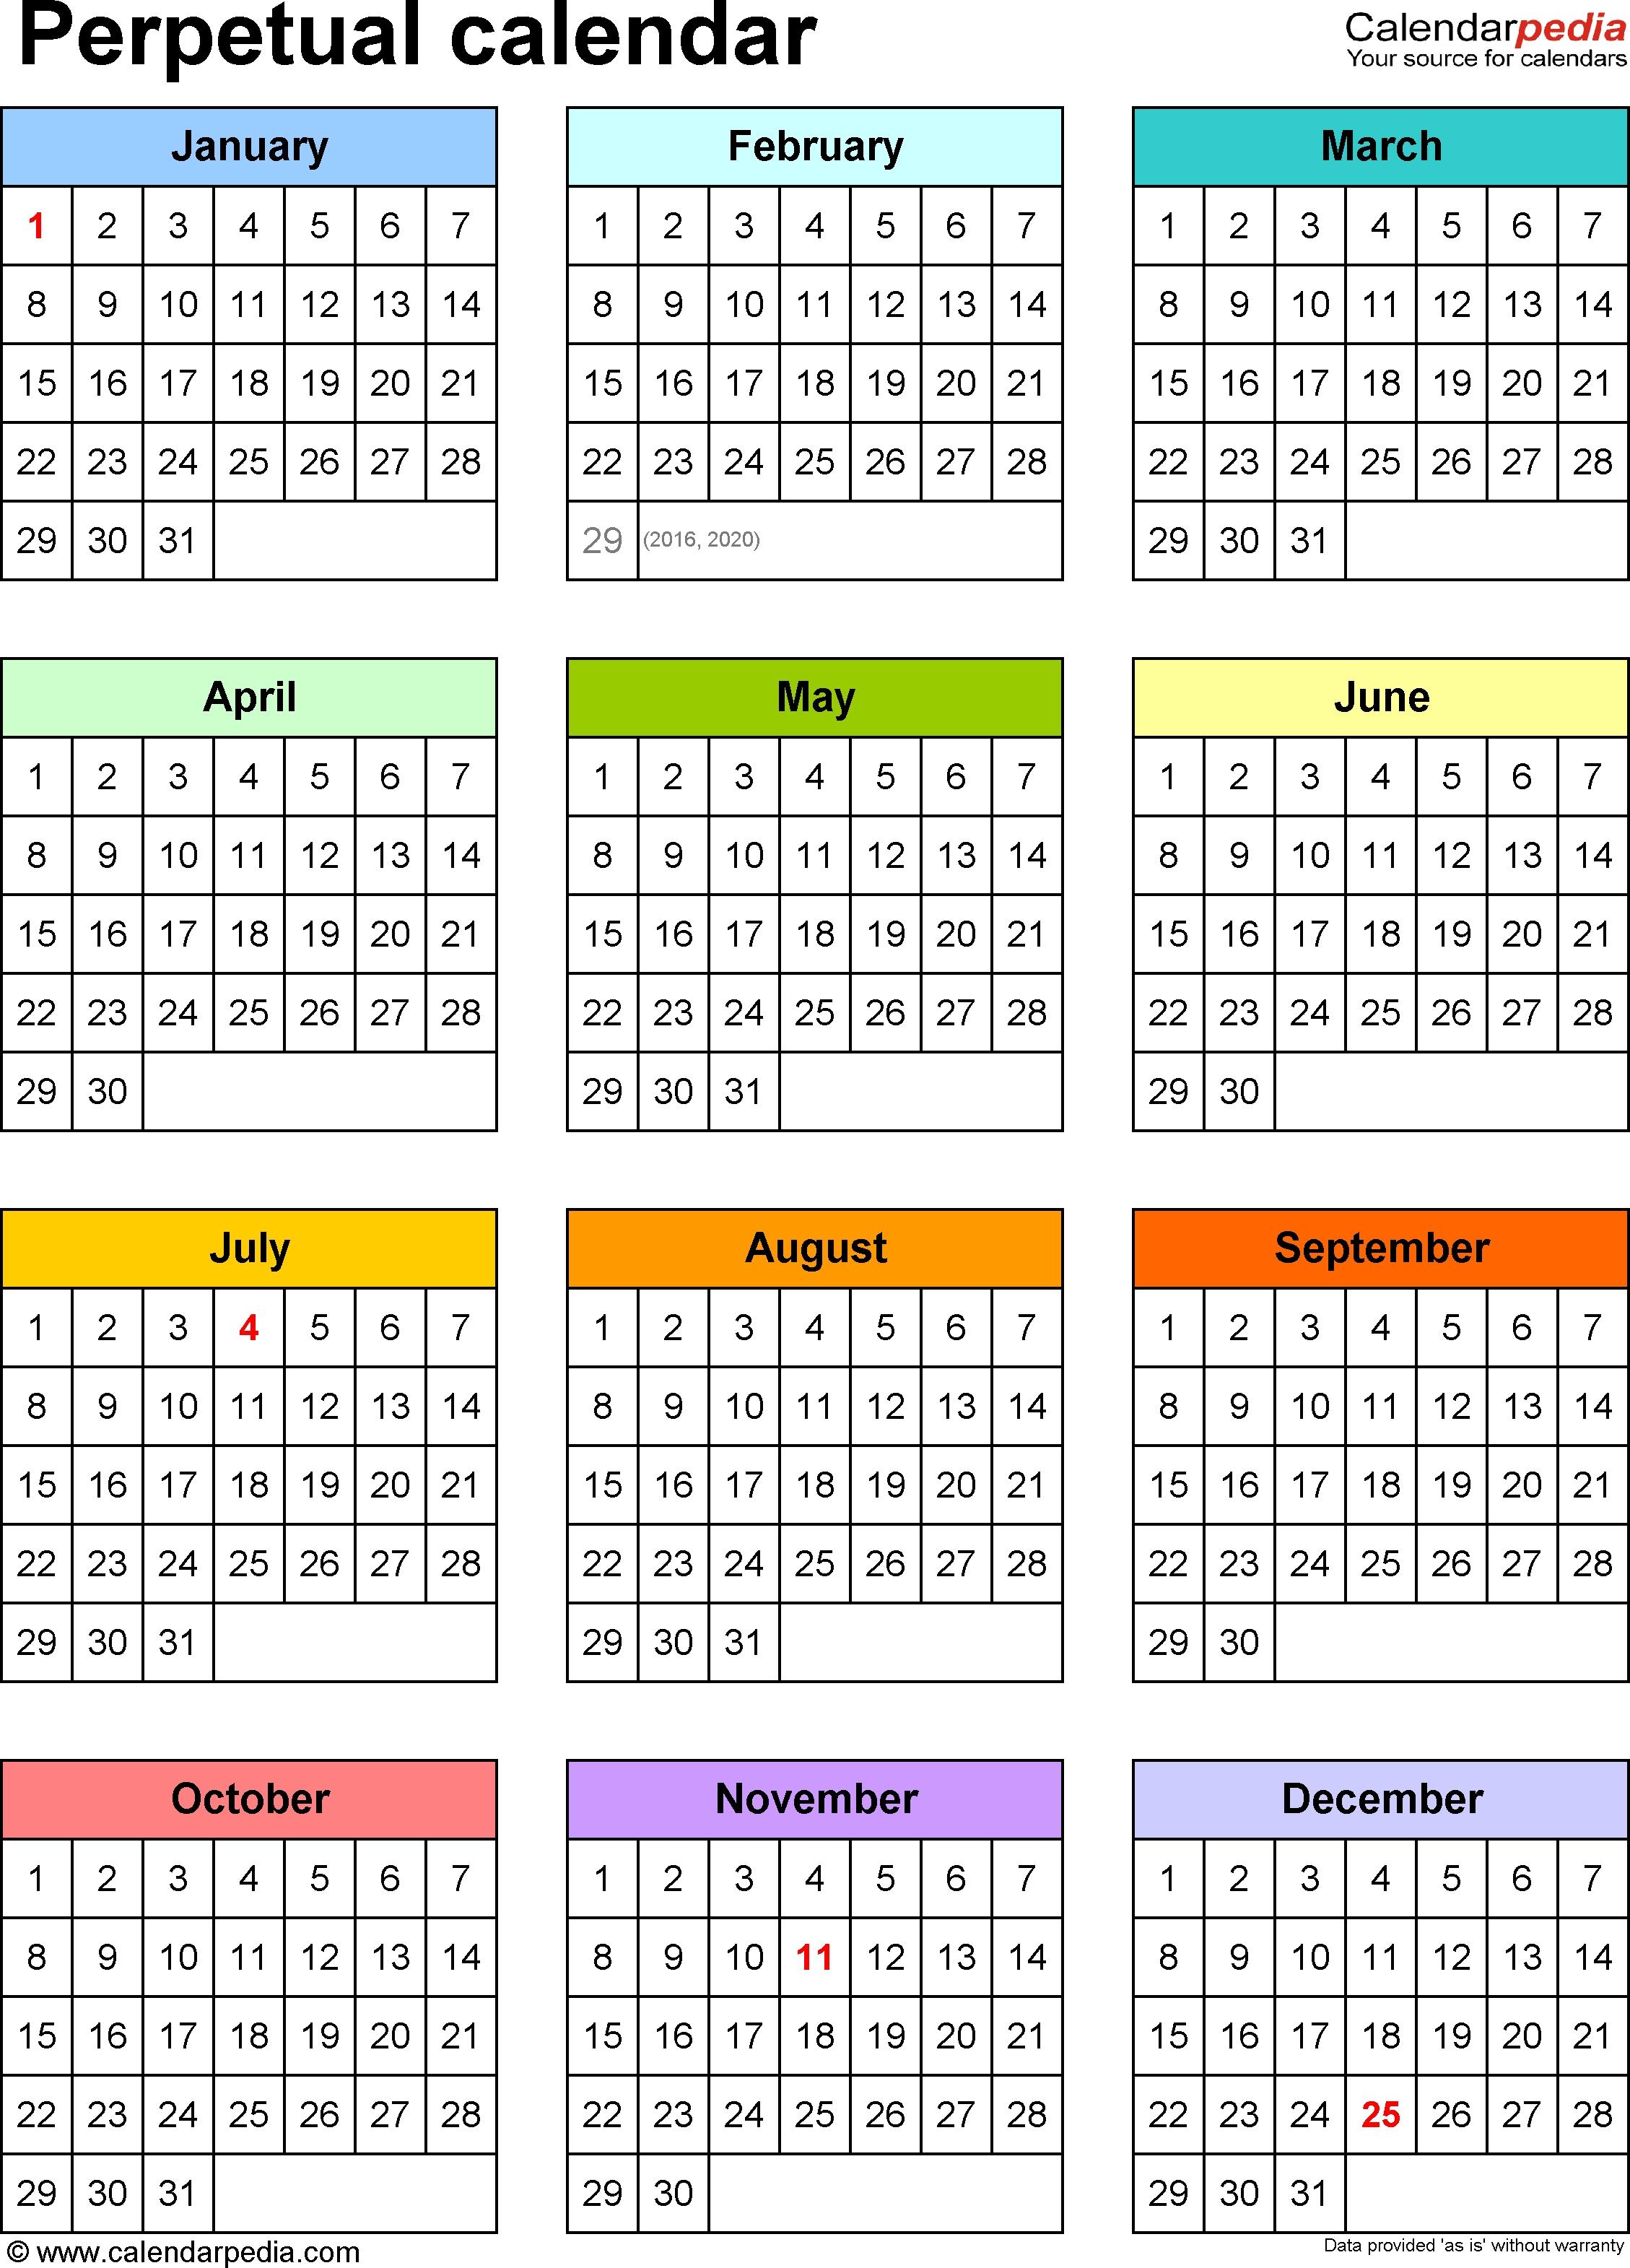 Perpetual Calendar 2019 - Vapha.kaptanband.co  Depo Provera Perpetual Calendar 2020